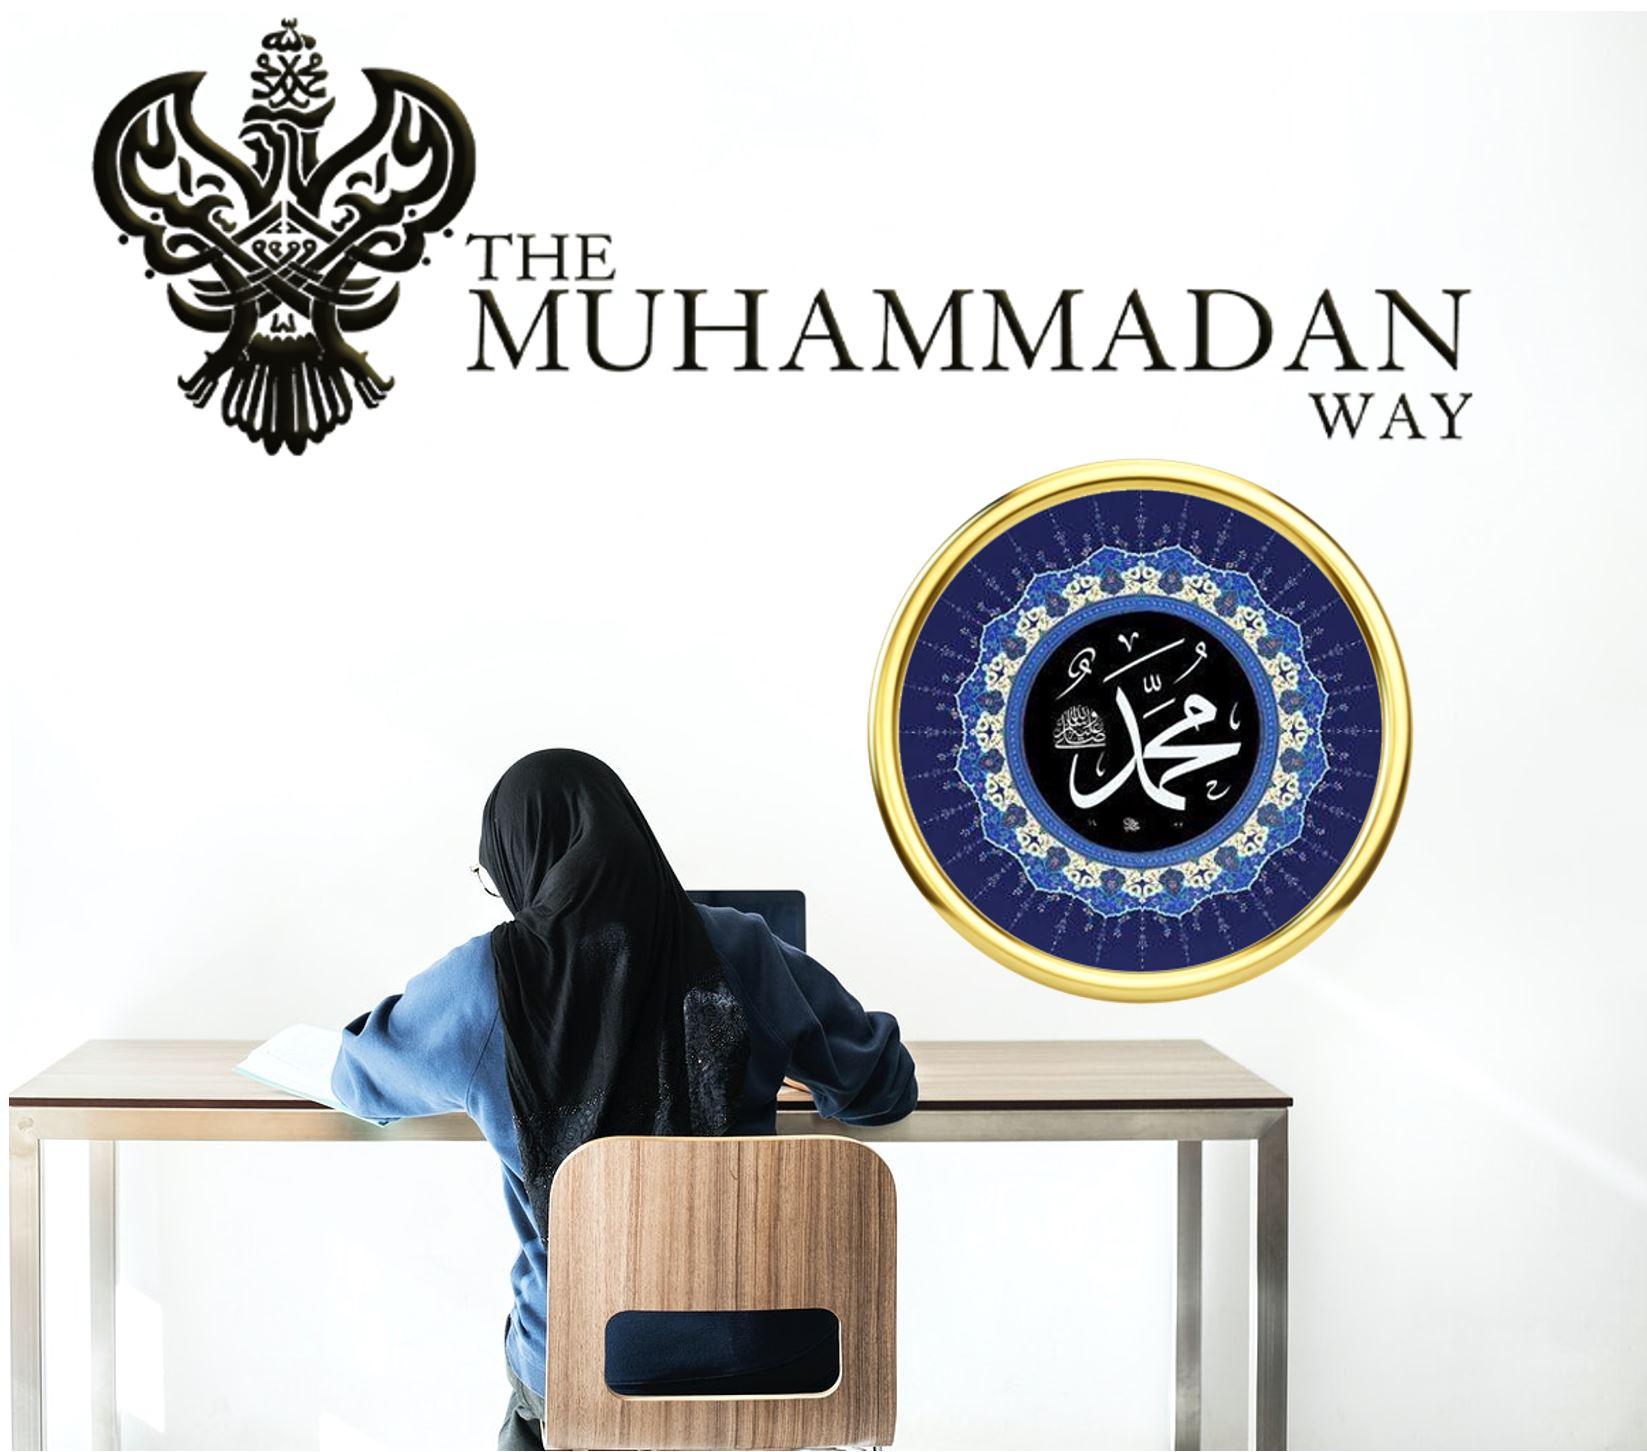 Muhammadan Way Student